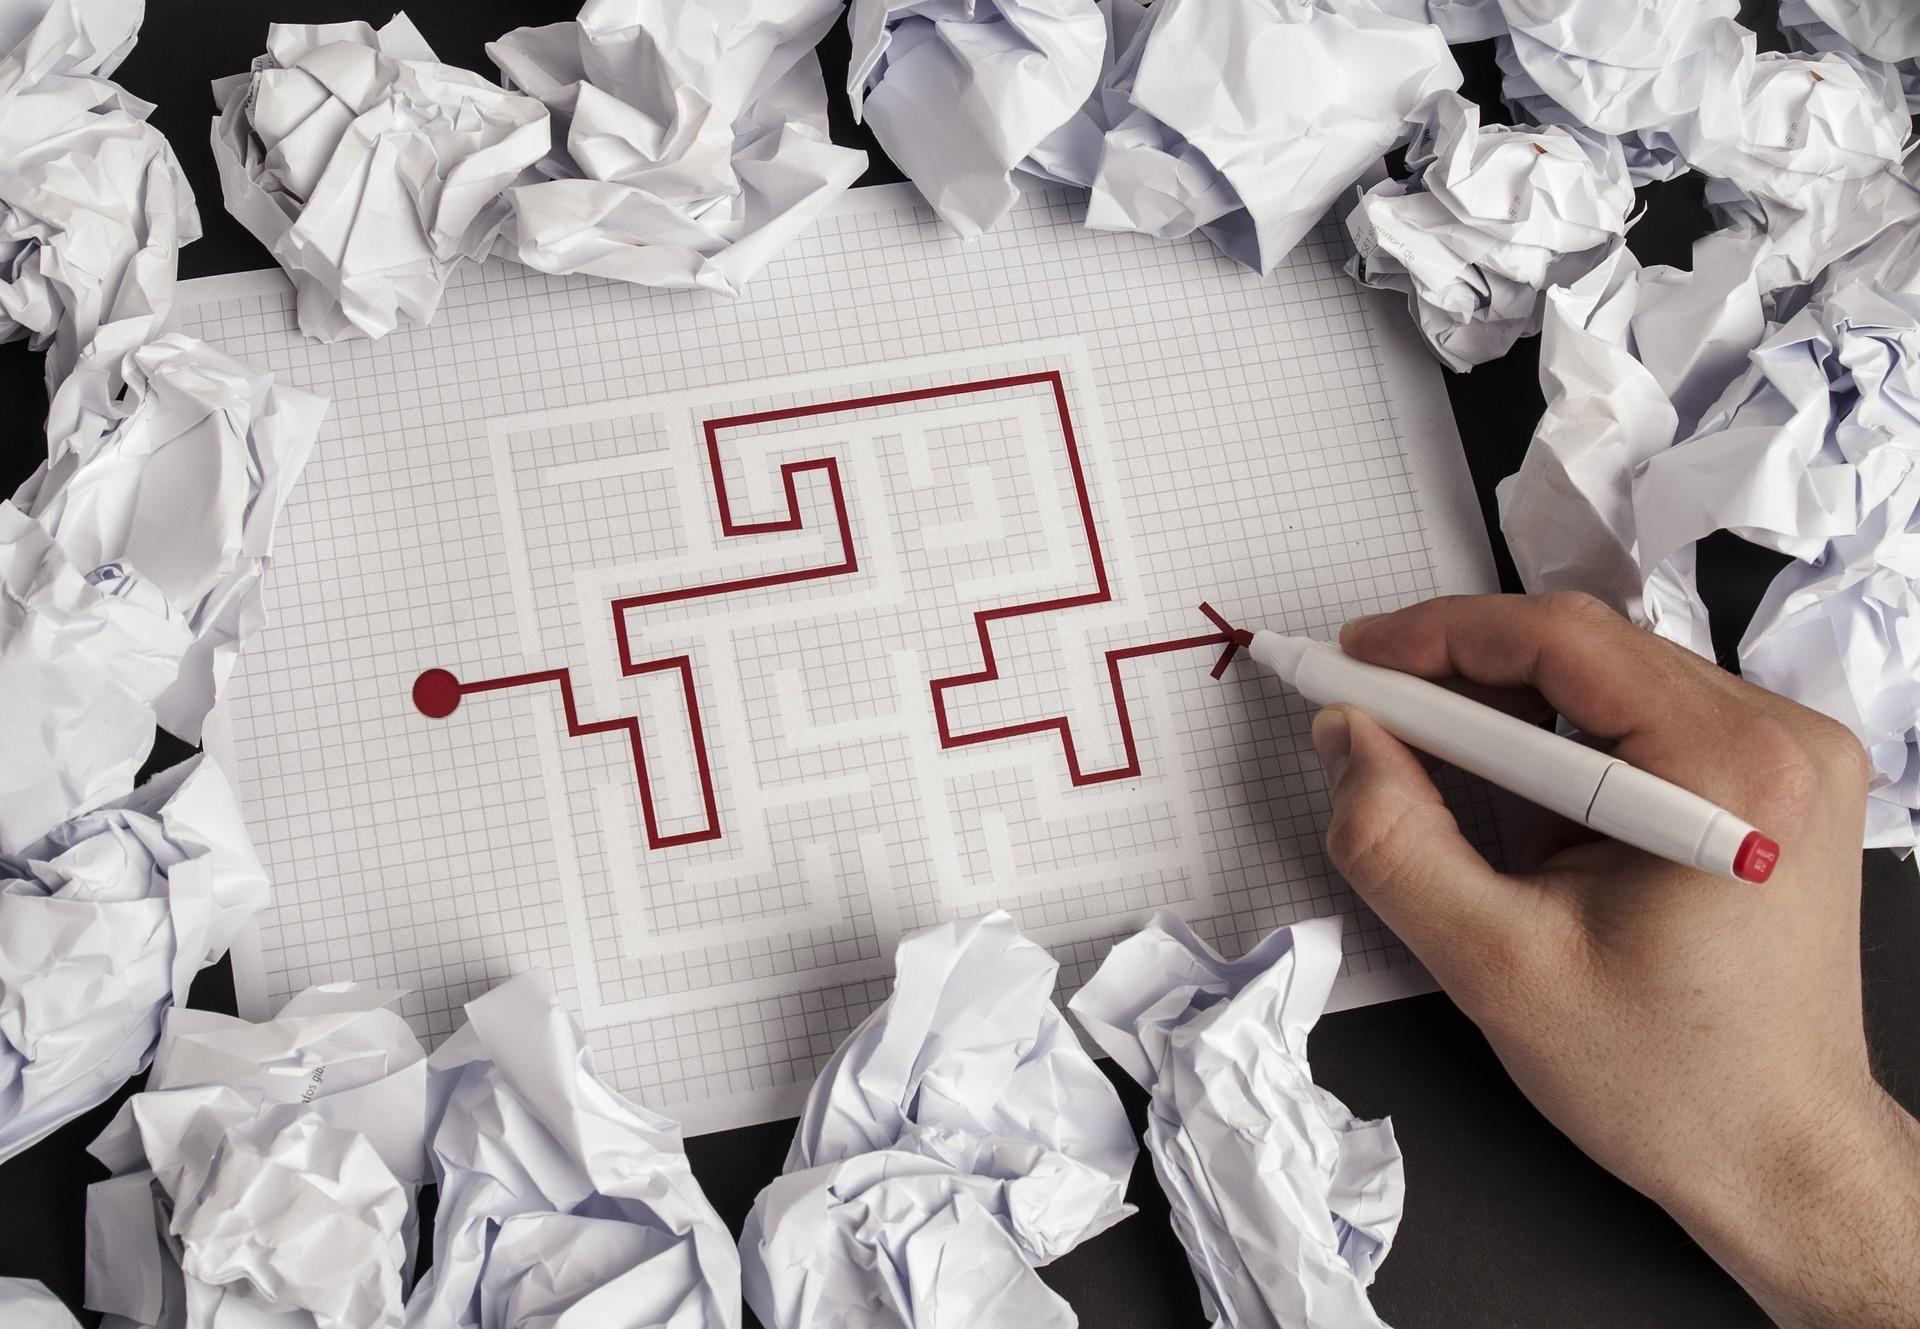 Digitalization as a business process - process